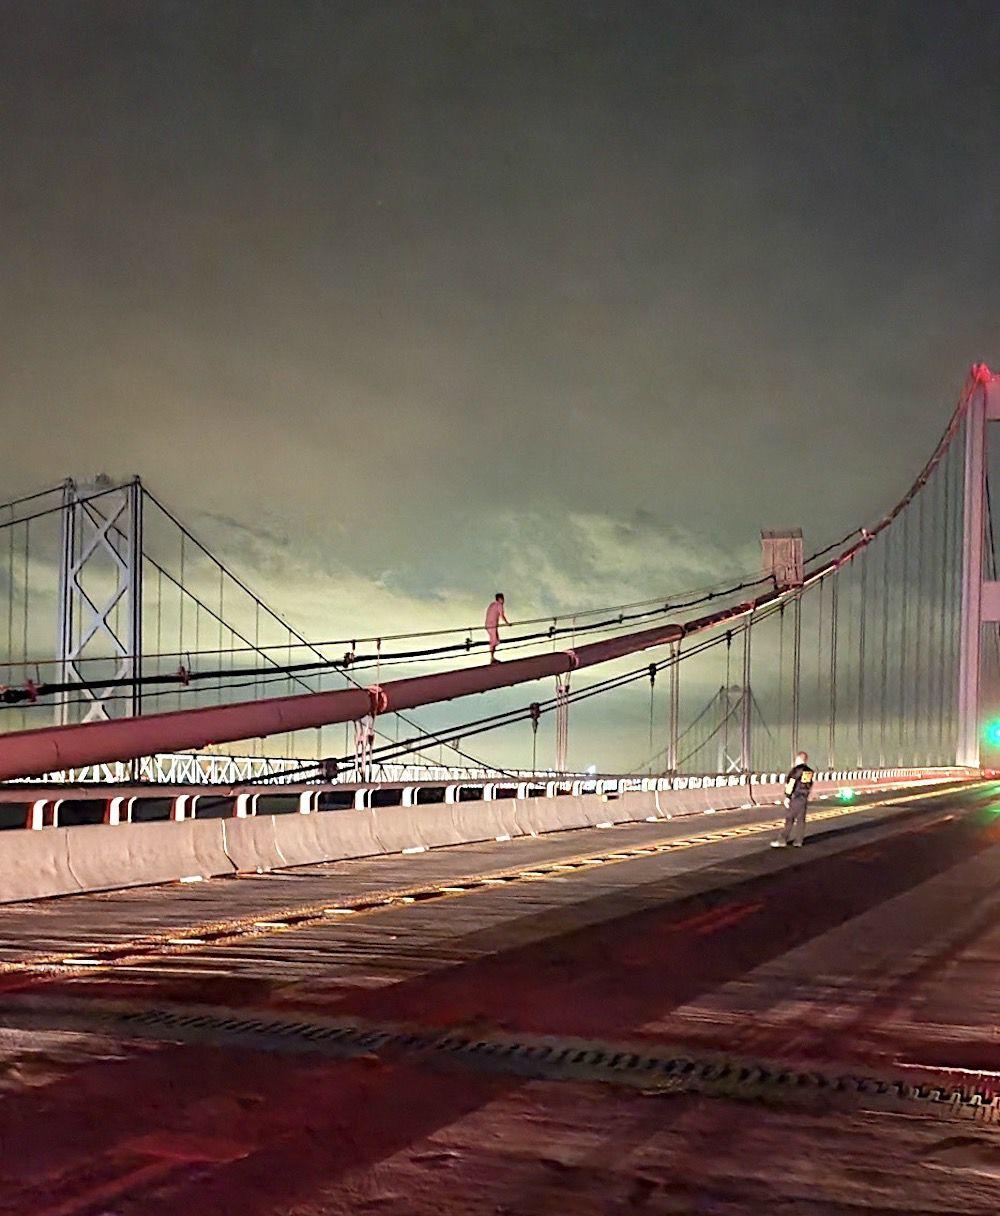 Bridge crisis has happy ending